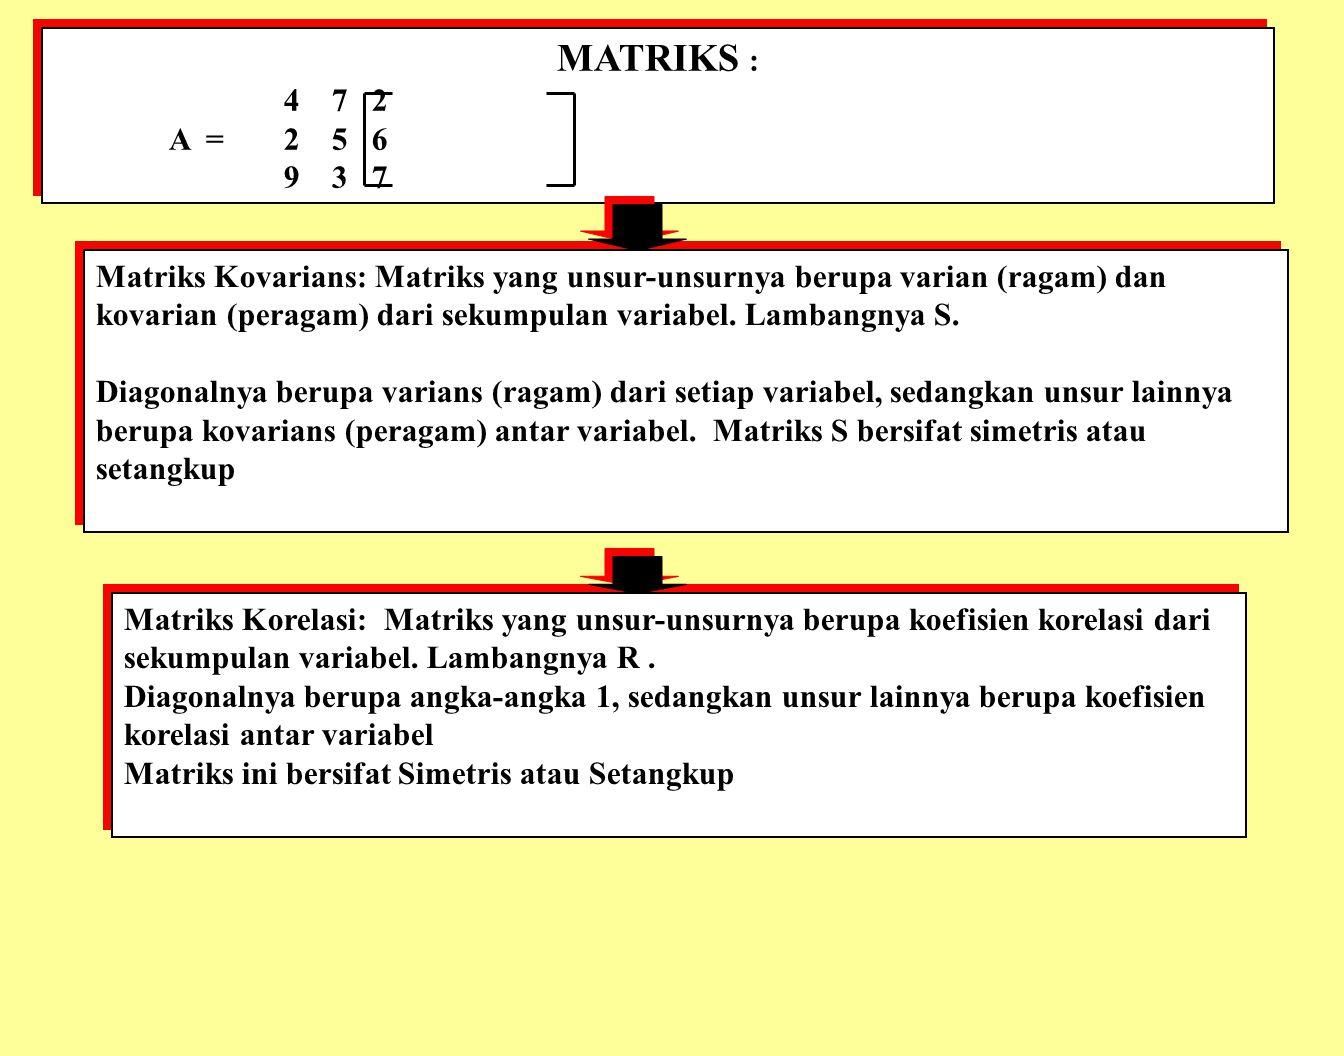 MATRIKS : 4 7 2 A = 2 5 6 9 3 7 MATRIKS : 4 7 2 A = 2 5 6 9 3 7 Matriks Kovarians: Matriks yang unsur-unsurnya berupa varian (ragam) dan kovarian (peragam) dari sekumpulan variabel.